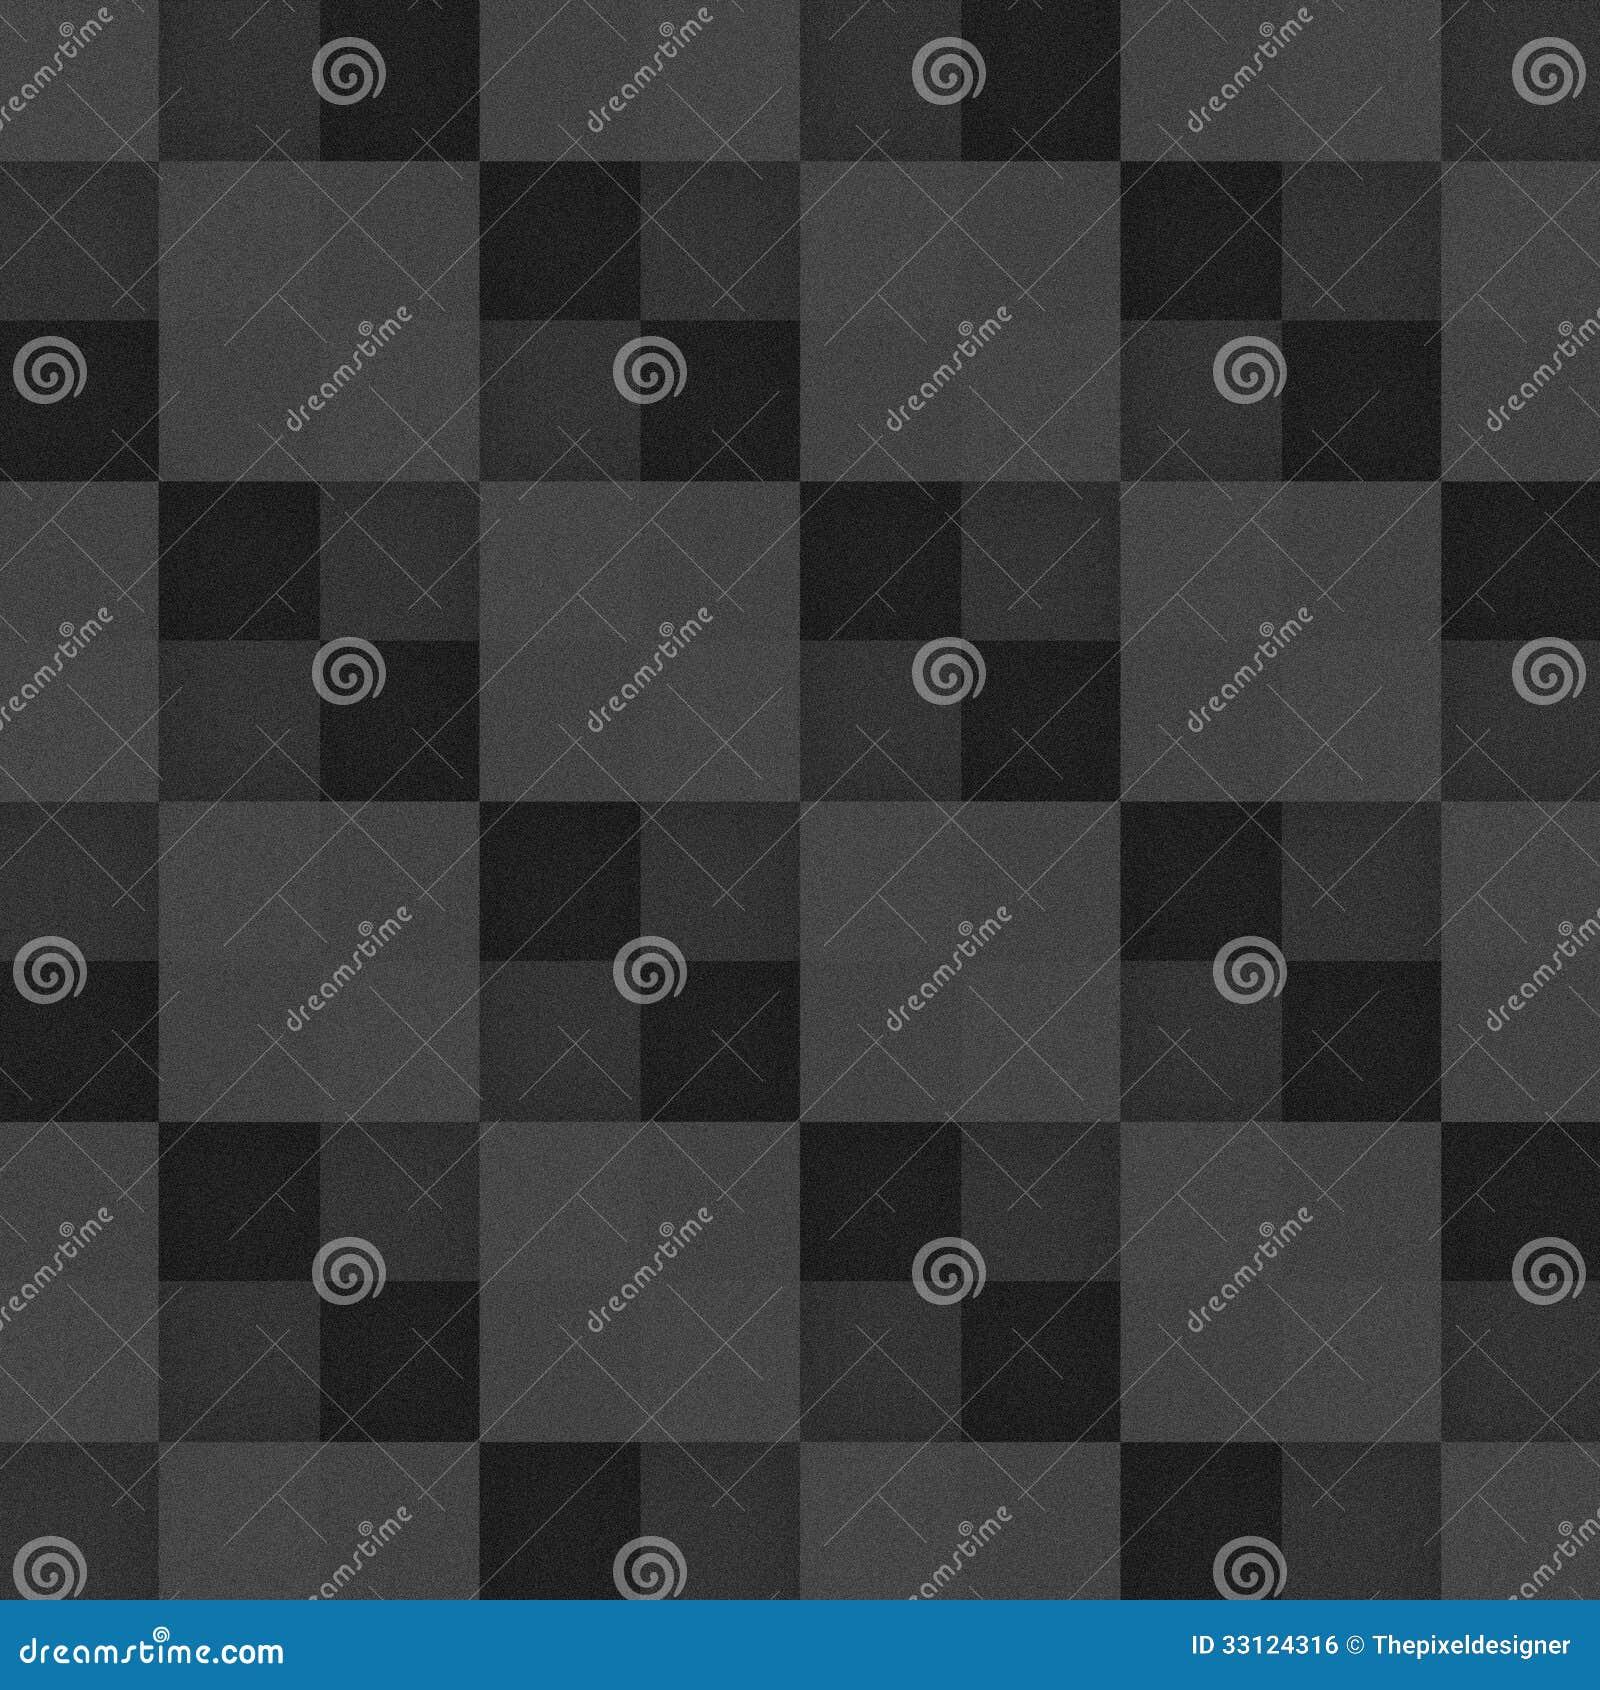 Black, Dark, Grey Background Royalty Free Stock Image